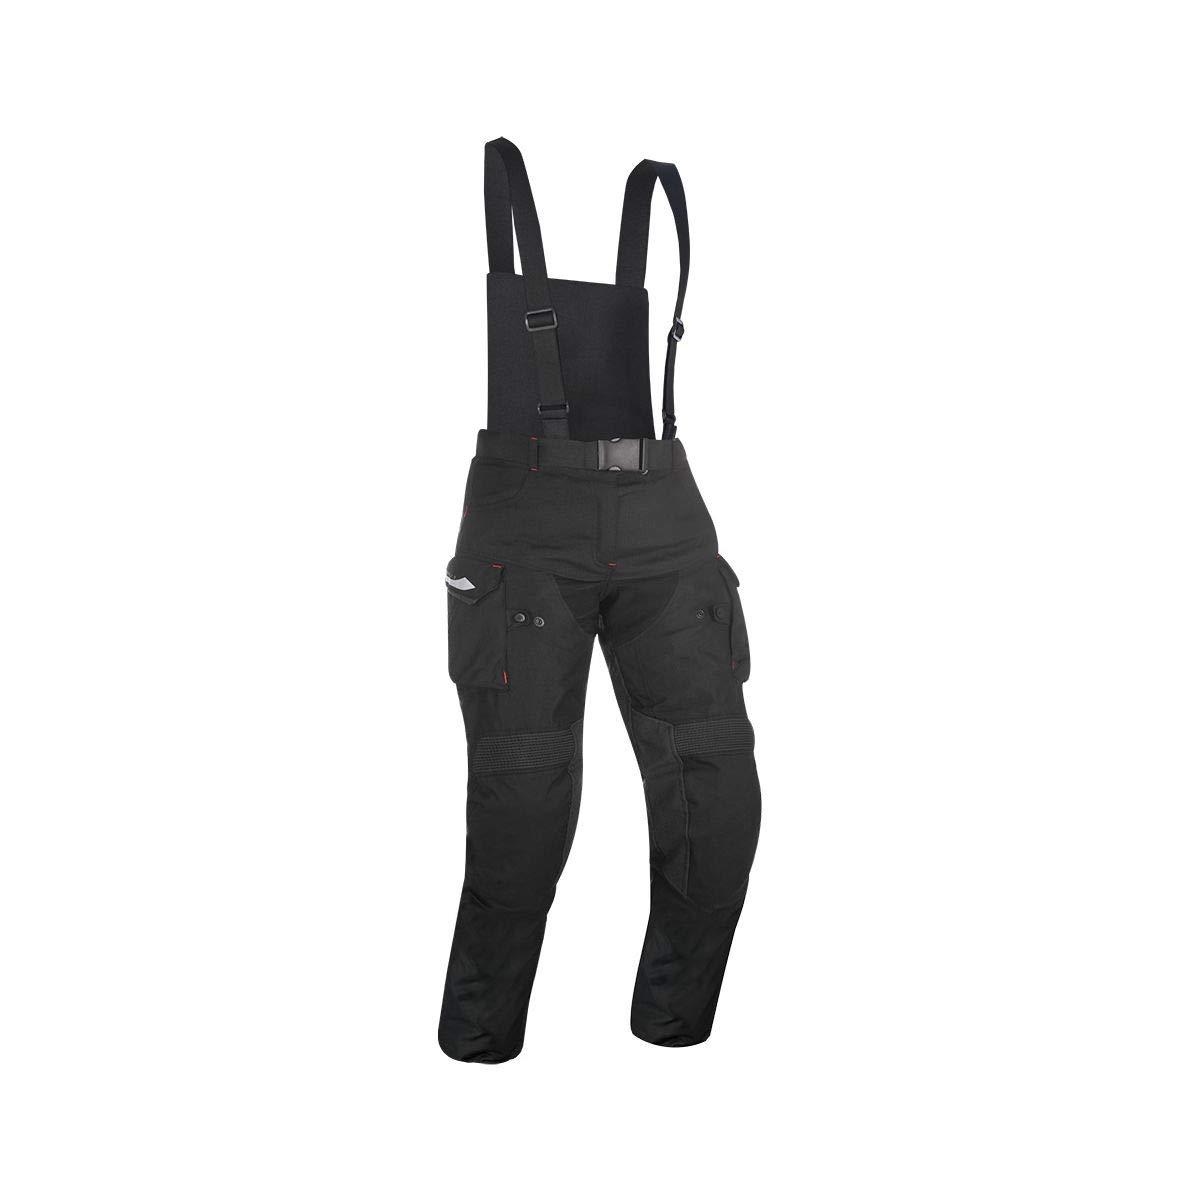 Talla XL Color Negro Oxford TM186201RXL Montreal 3.0 Pantal/ón de Moto